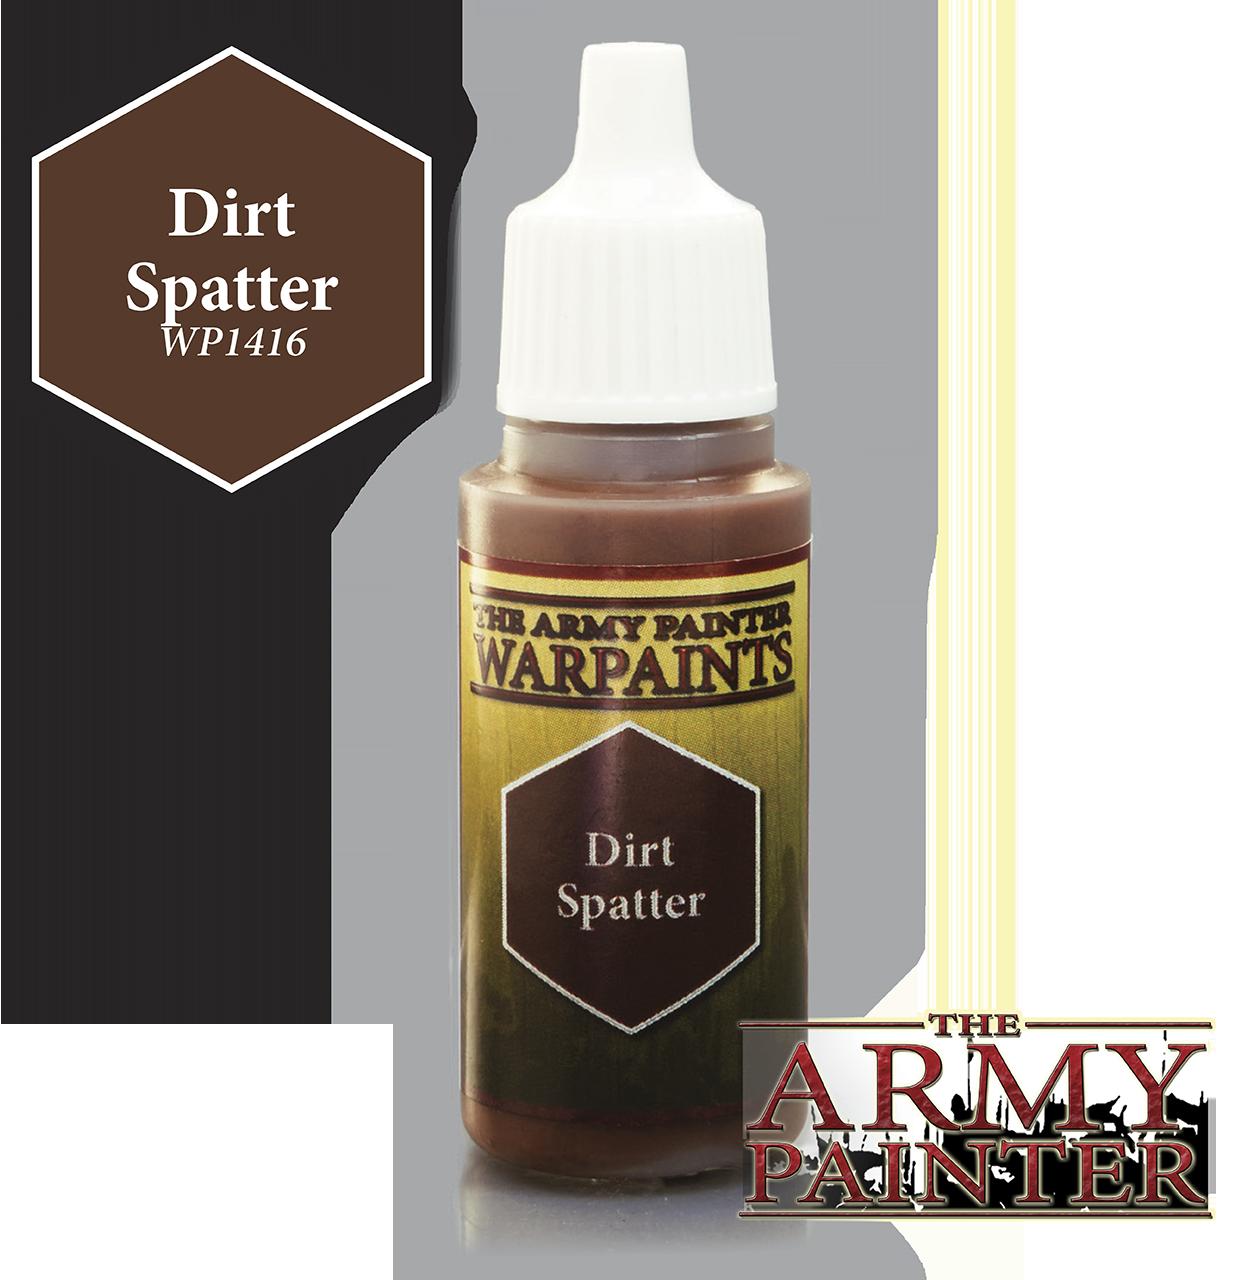 Dirt Splatter - Army Painter Warpaints